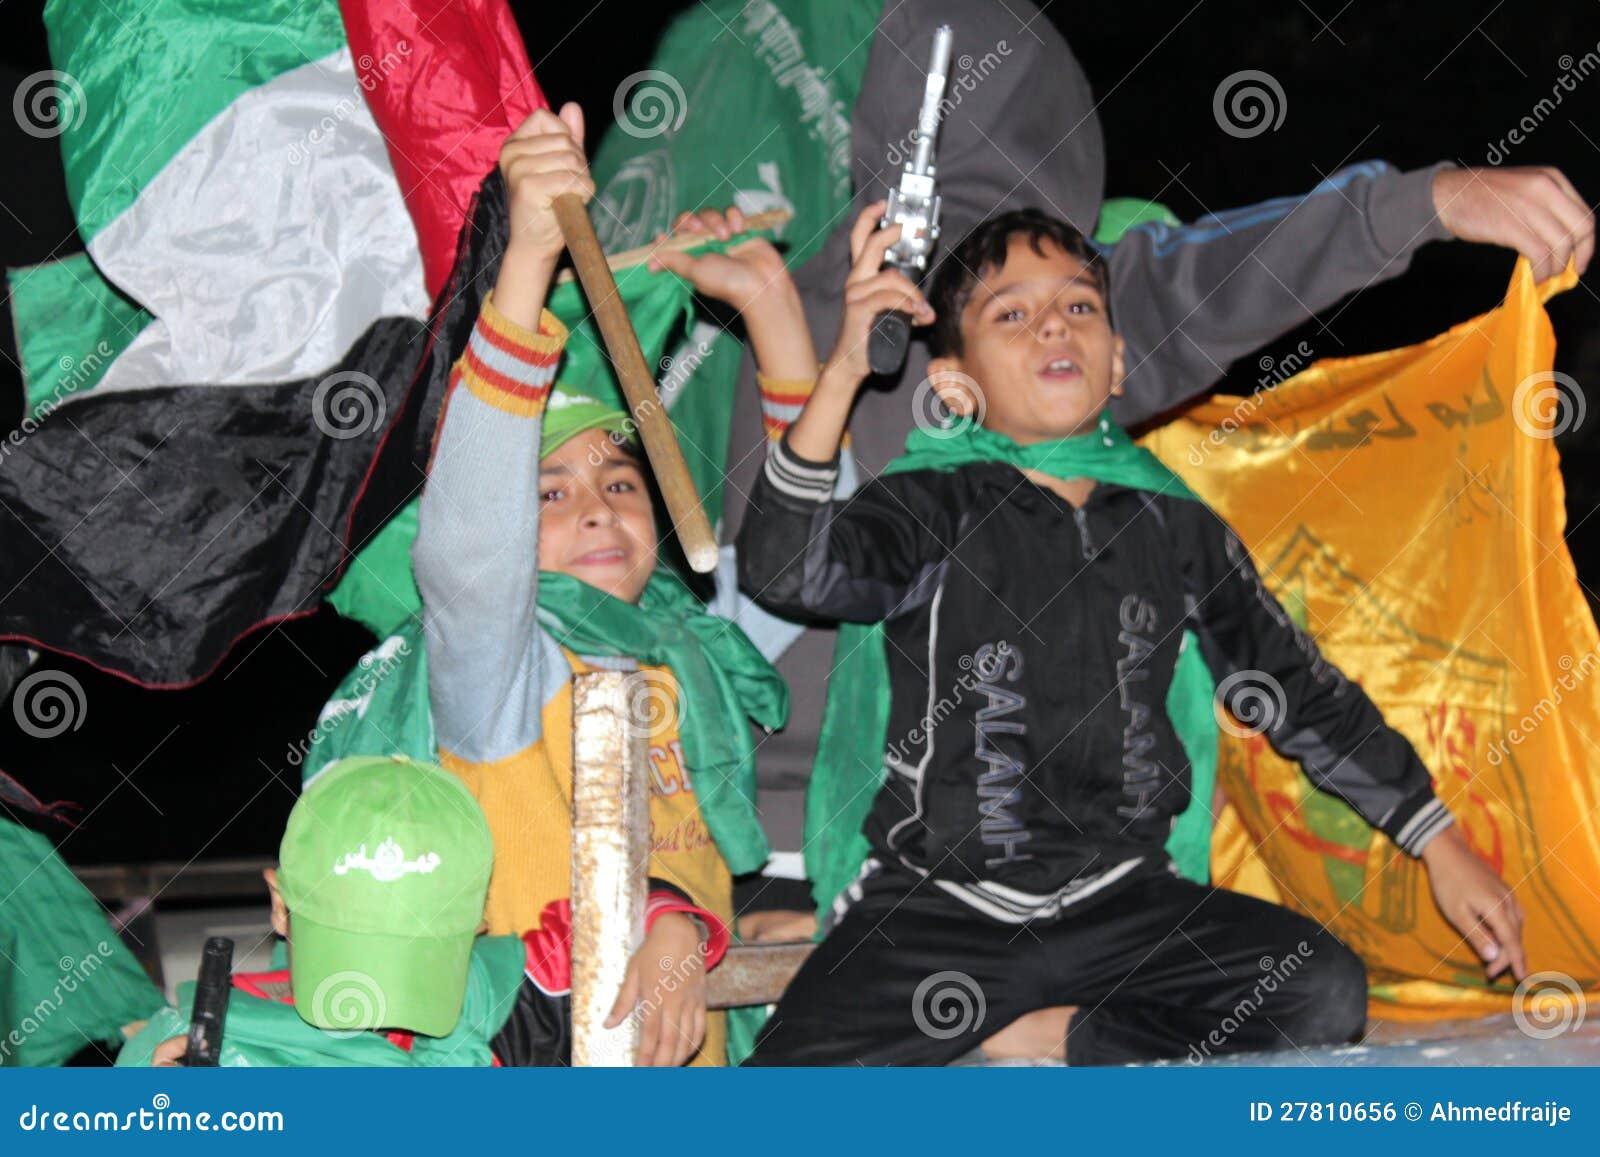 Victory celebrations in Gaza